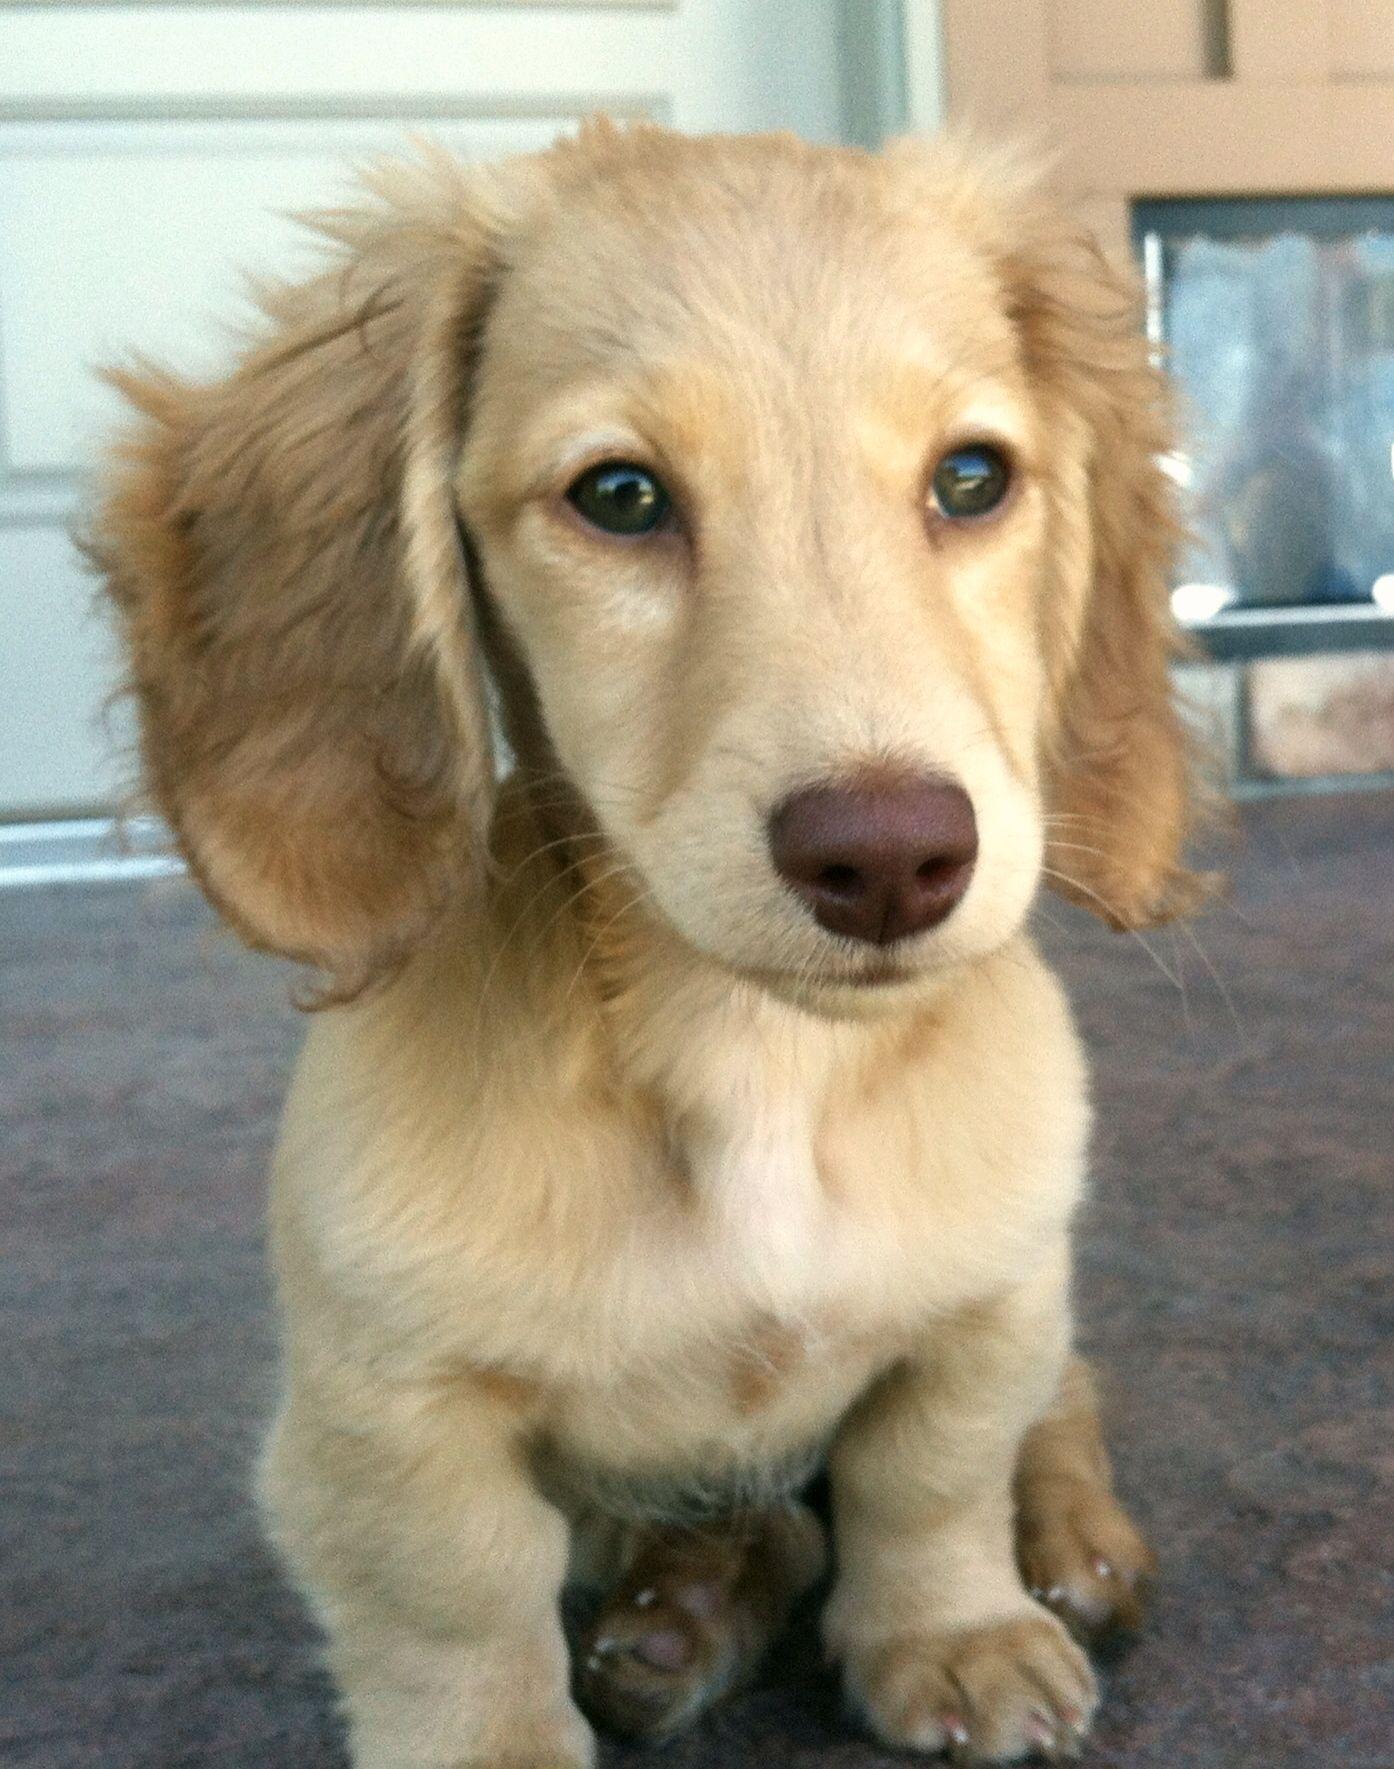 Willa Chocolate Based Cream Longhair Dachshund Puppy Dachshund Dachshund Breed Dachshund Love